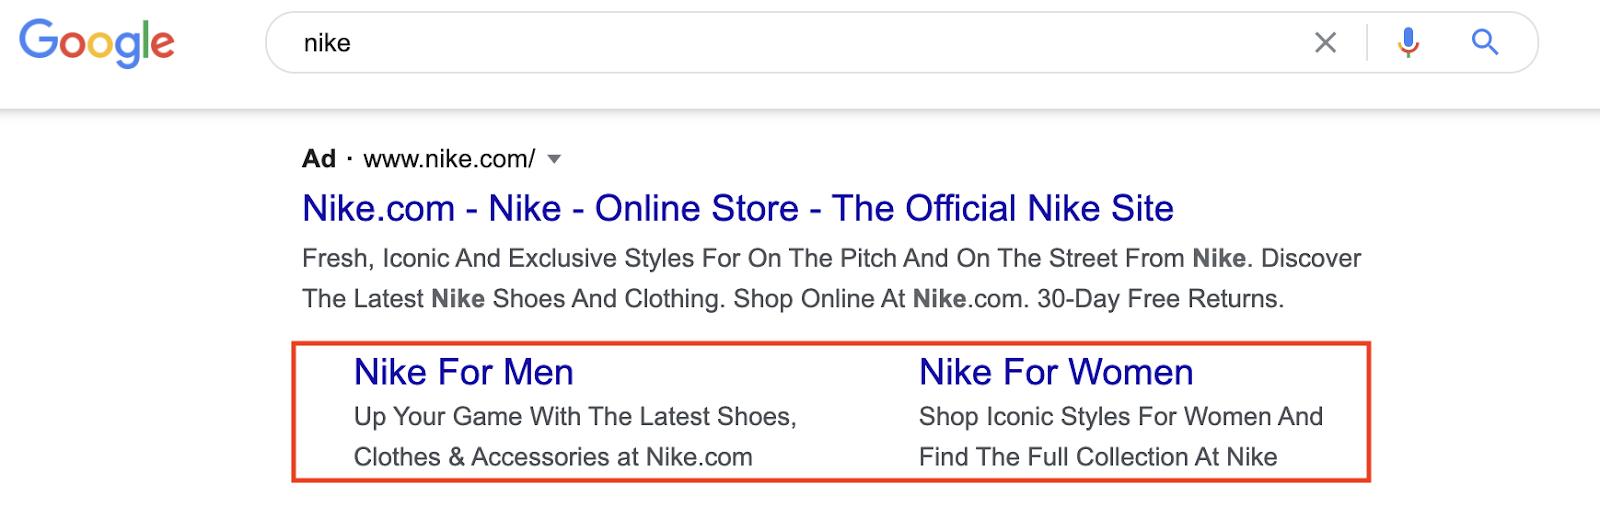 Rich Google Ads